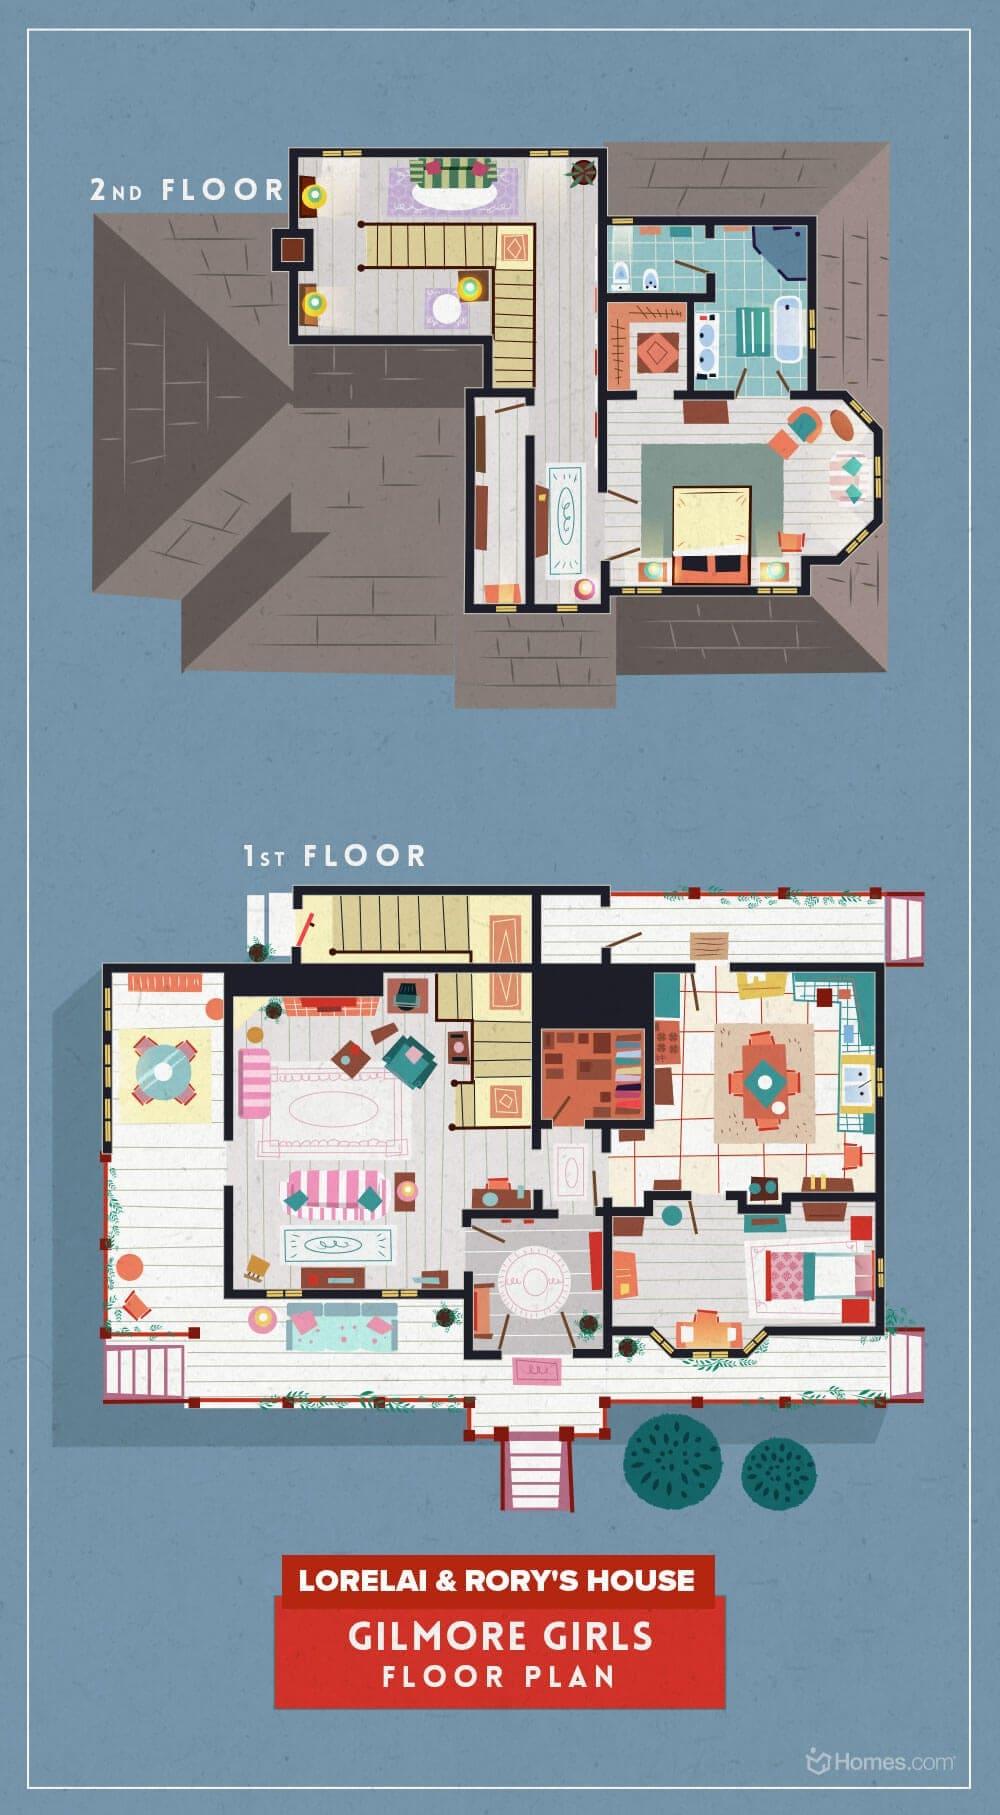 home-floor-plans-illustrations-4